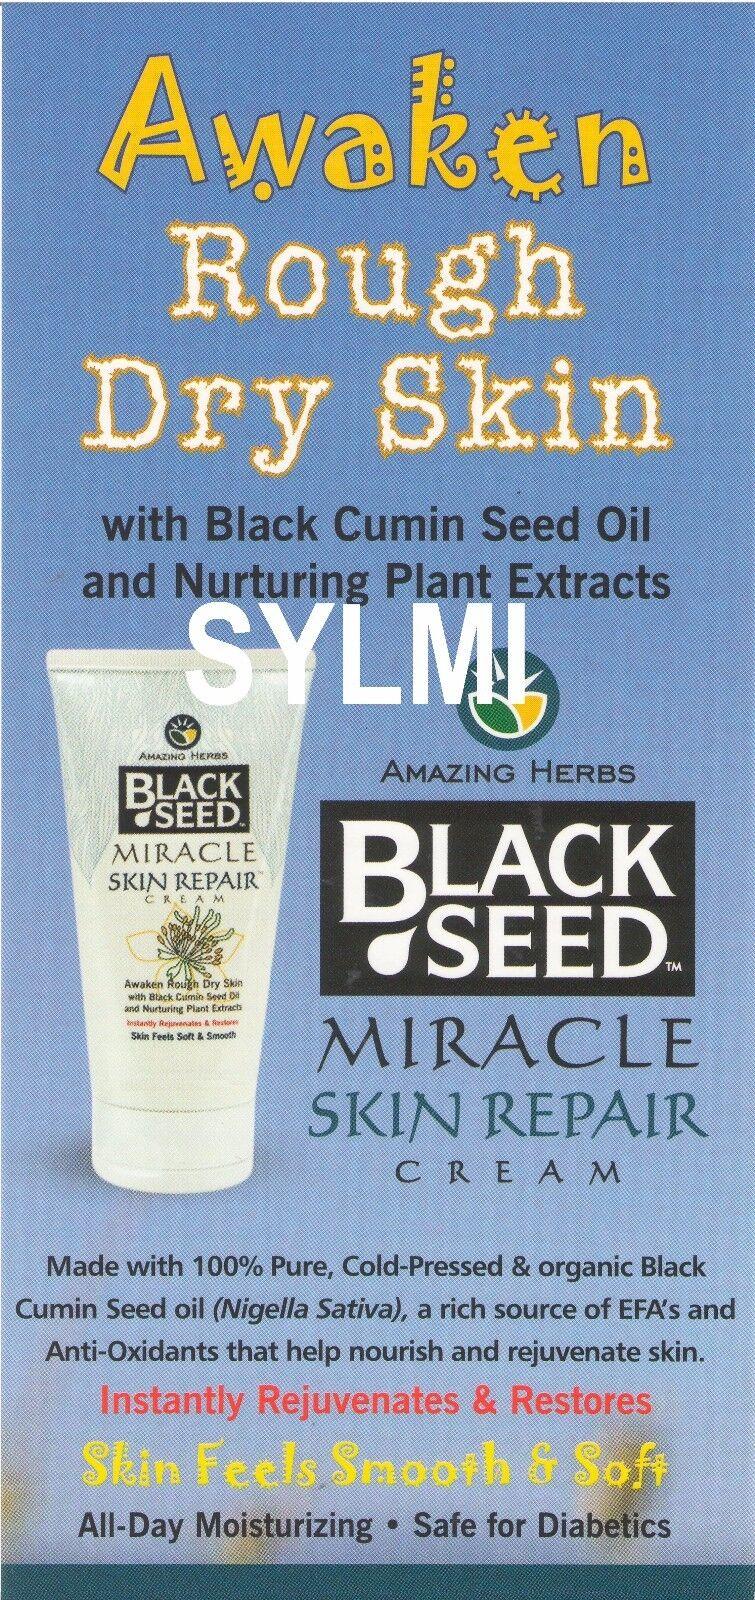 Black Seed Miracle Skin Repair Cream 6 Ounce 6oz